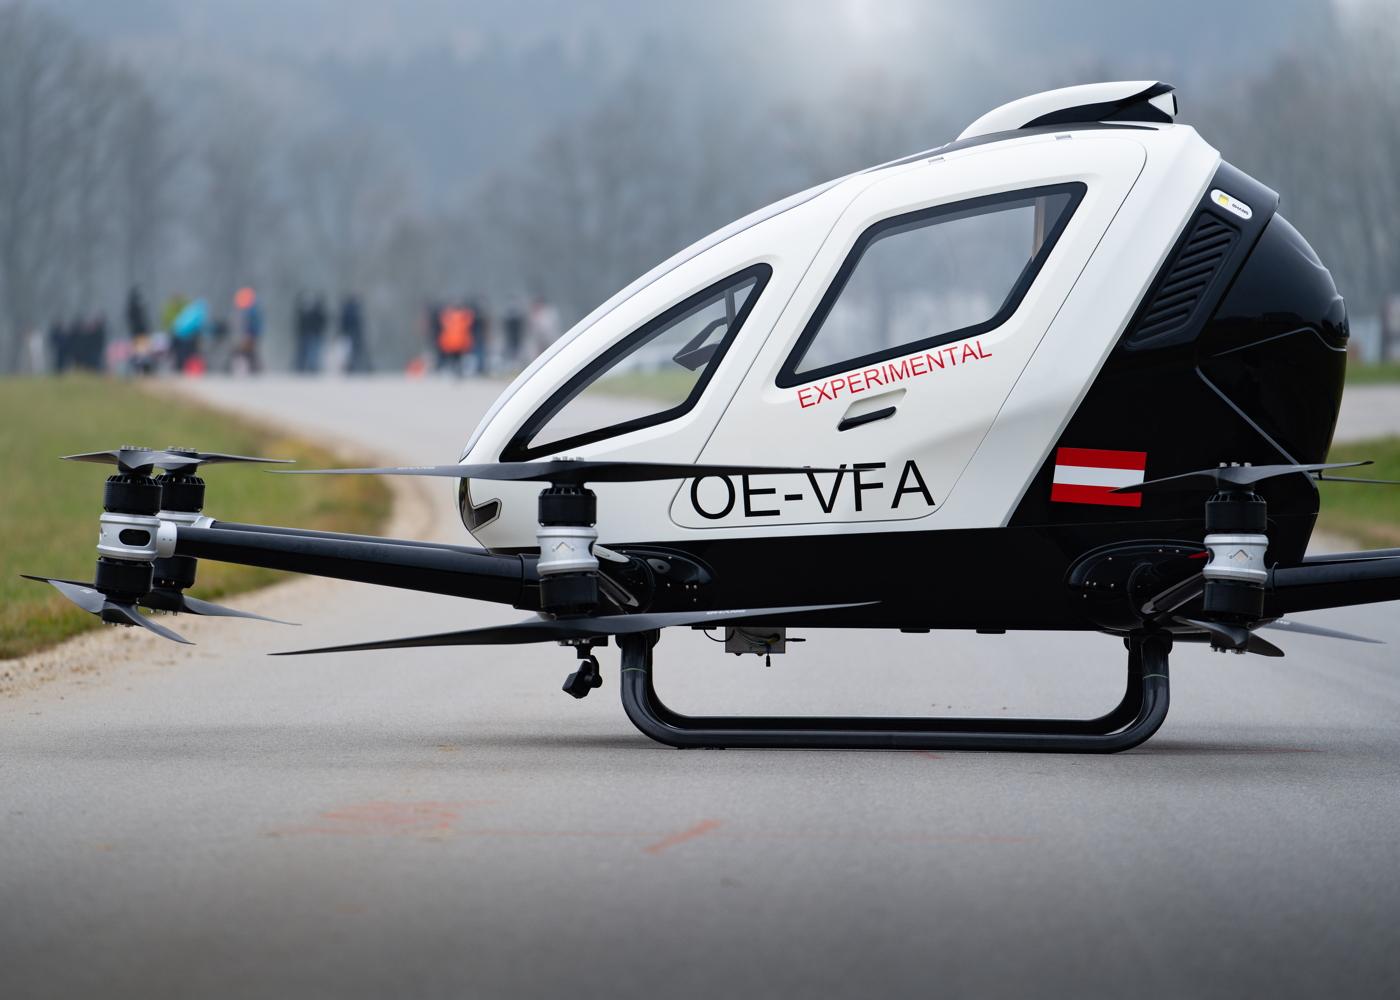 EH216 Austrian registered